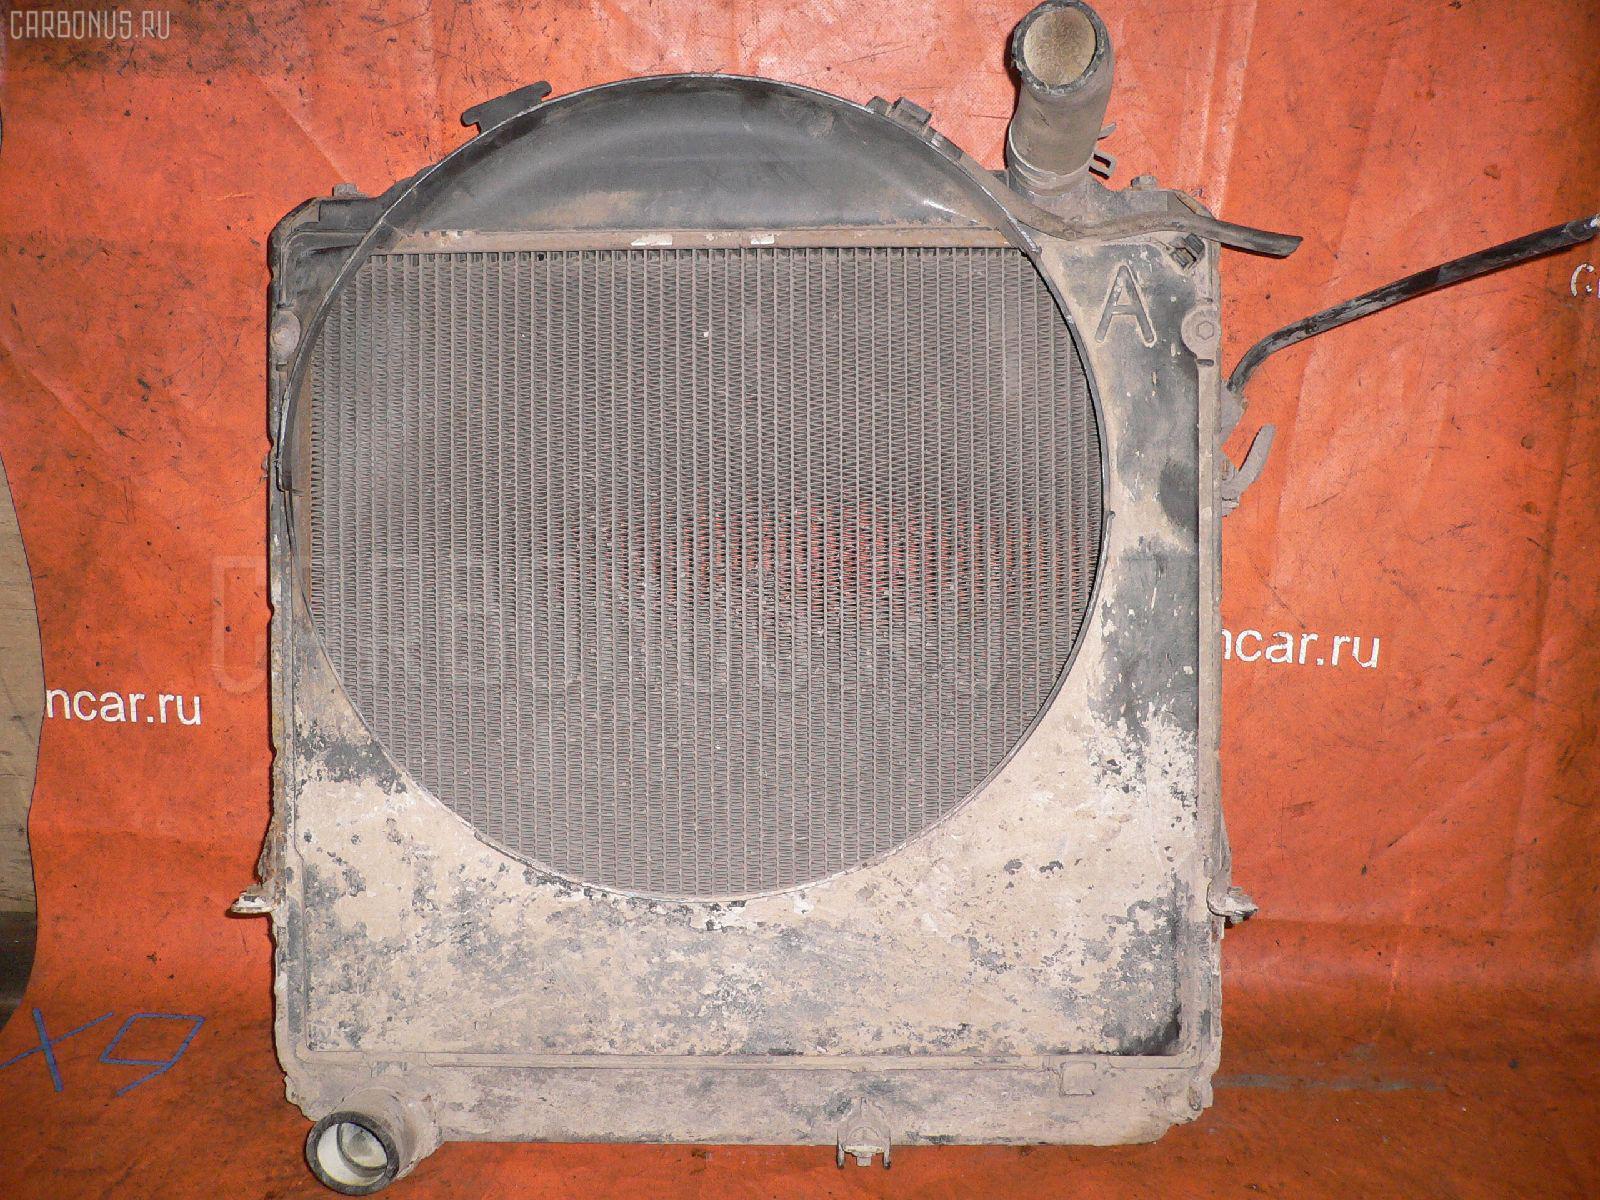 Радиатор ДВС TOYOTA DYNA BU102 15B-F Фото 1